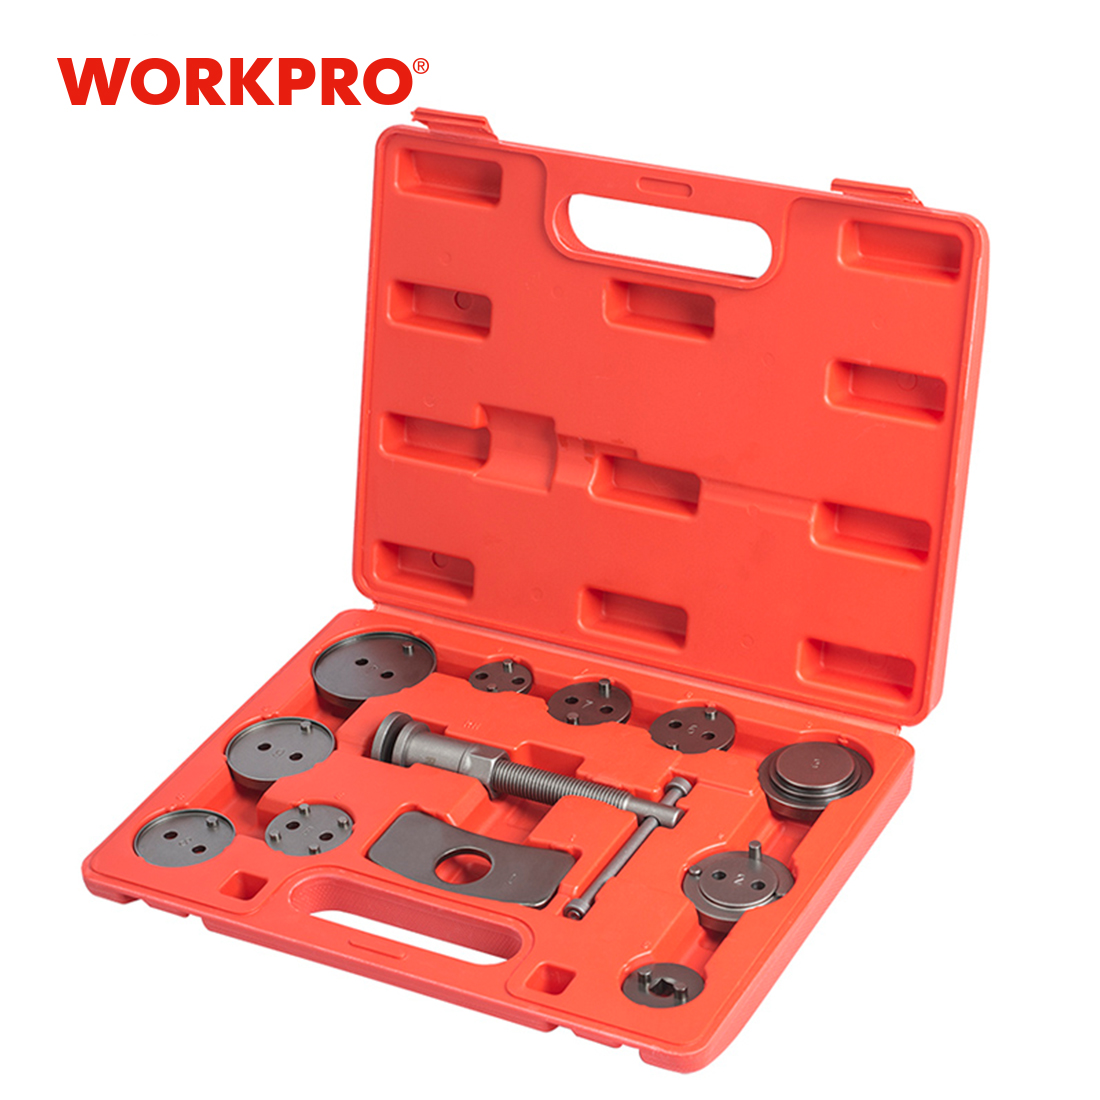 WORKPRO 12PC Car Repair Tools Auto Repair Tool Set Disc Brake Caliper Wind Back Tool Kits